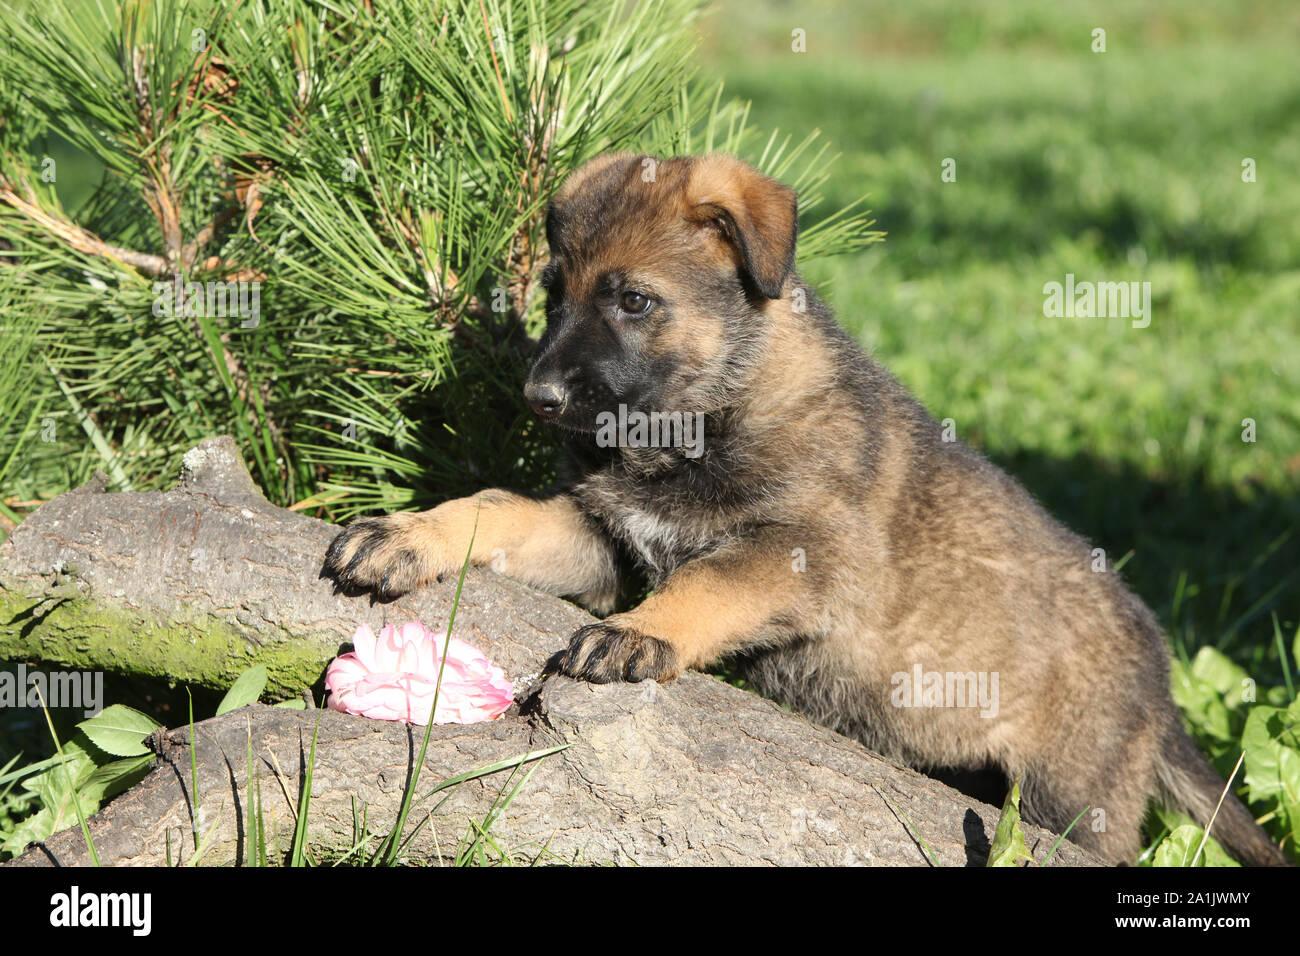 Adorable Brown German Shepherd Puppy In The Garden Stock Photo Alamy